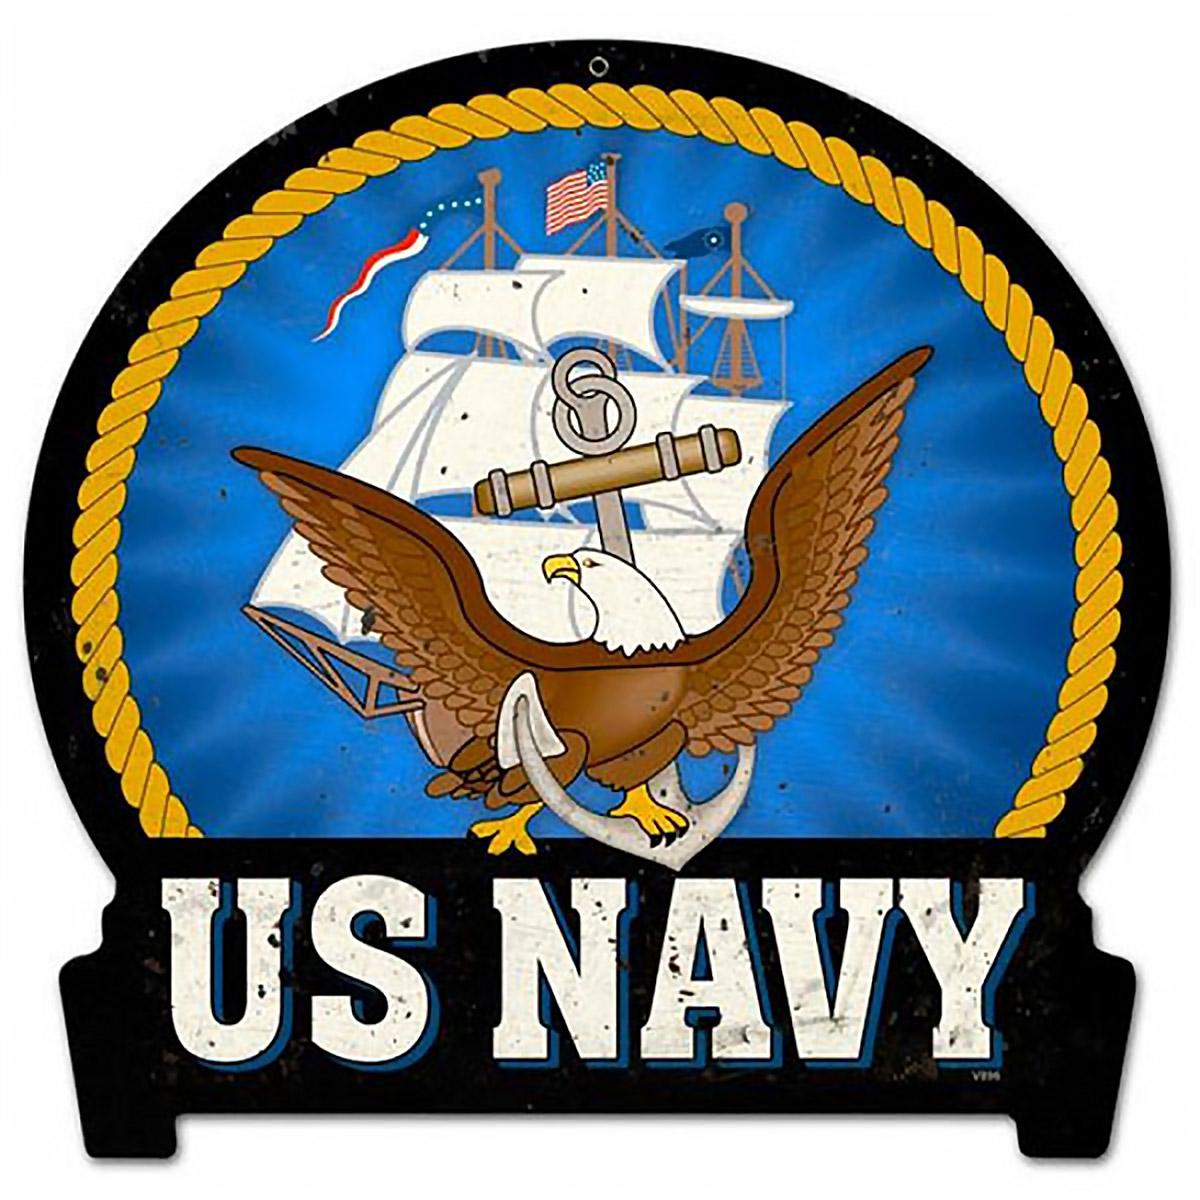 free us navy logo  download free clip art  free clip art Medical Symbol Solid Medical Insignia Clip Art